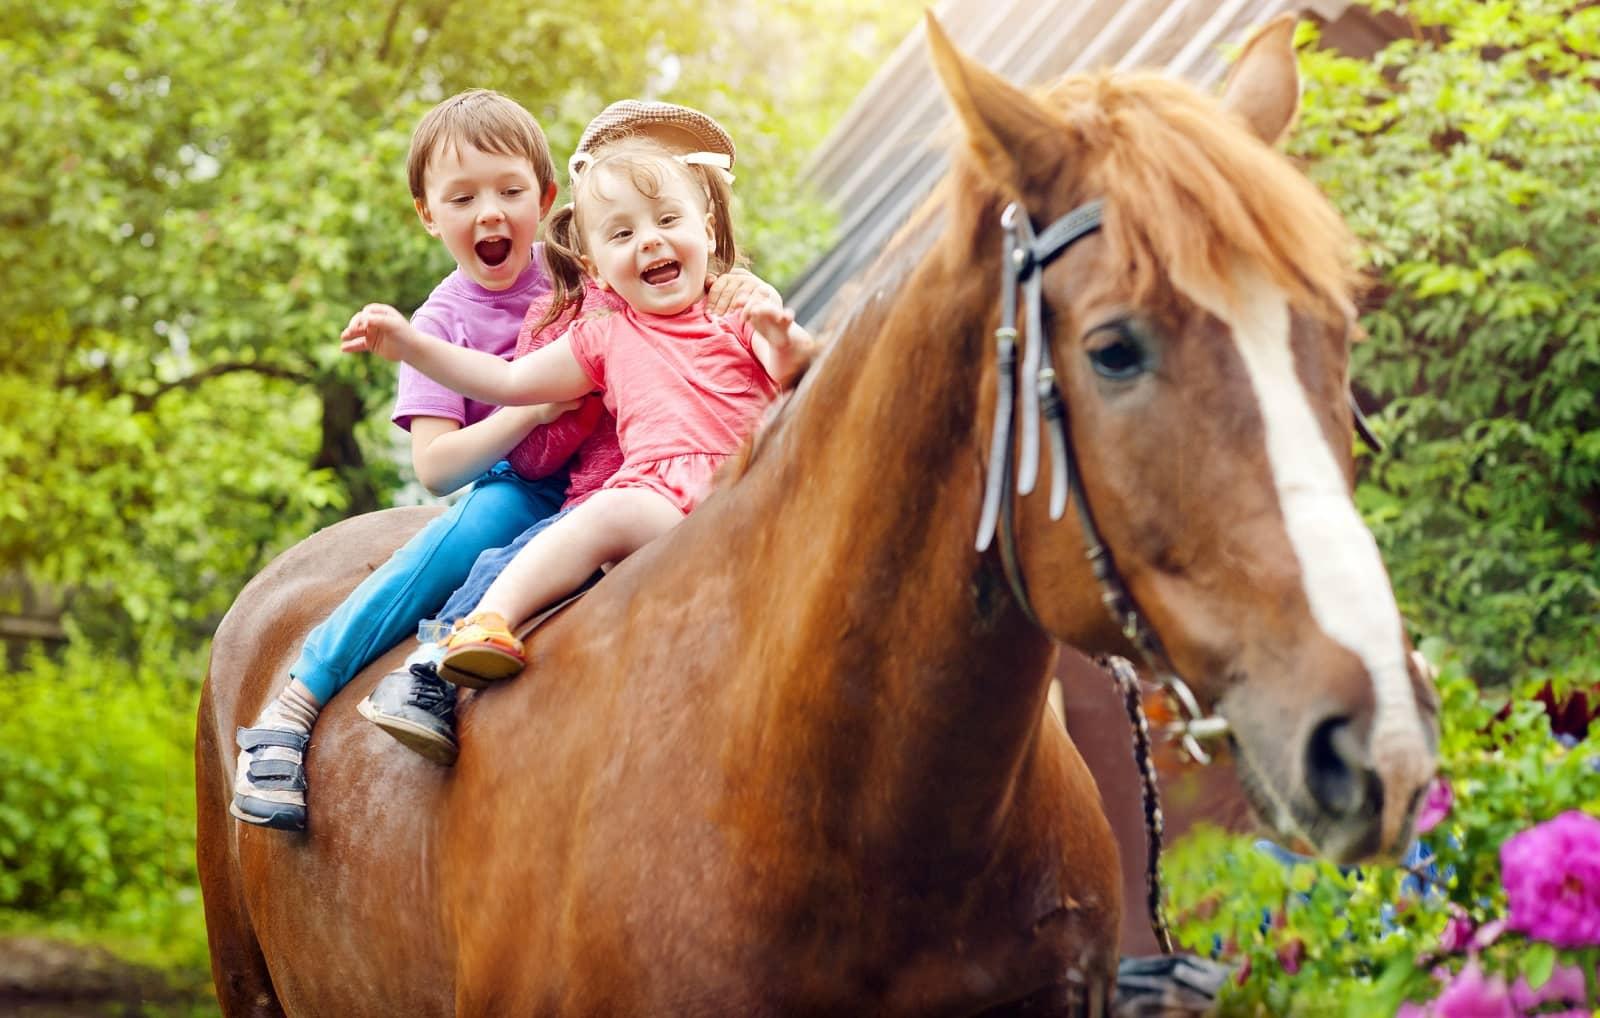 Siblings riding horse